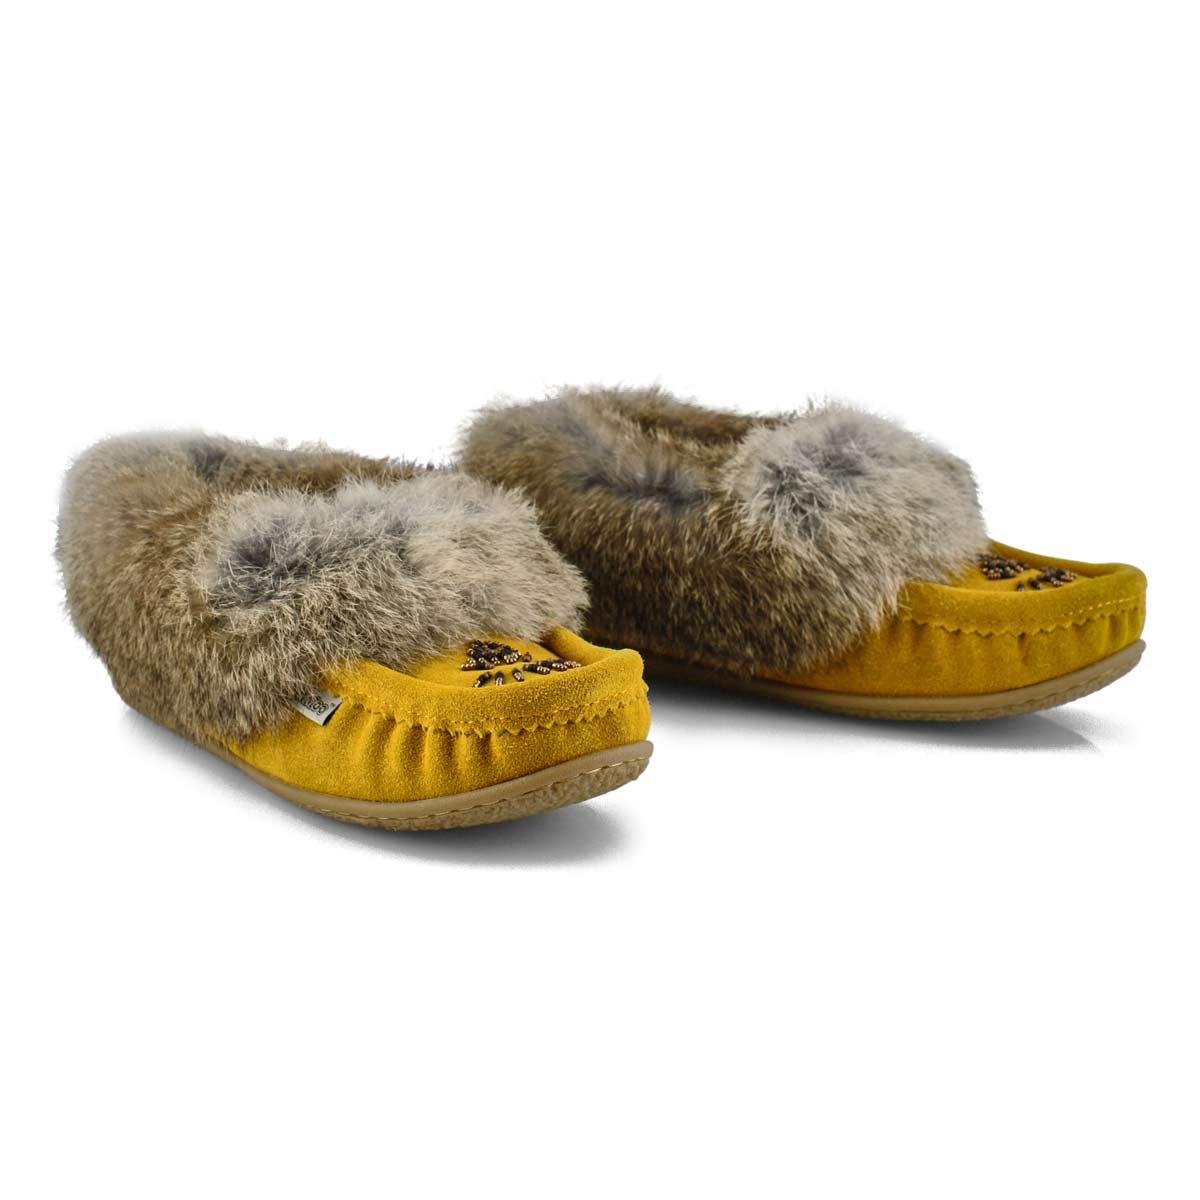 Women's Cute 5 Rabbit Fur Moccasin - Mustard